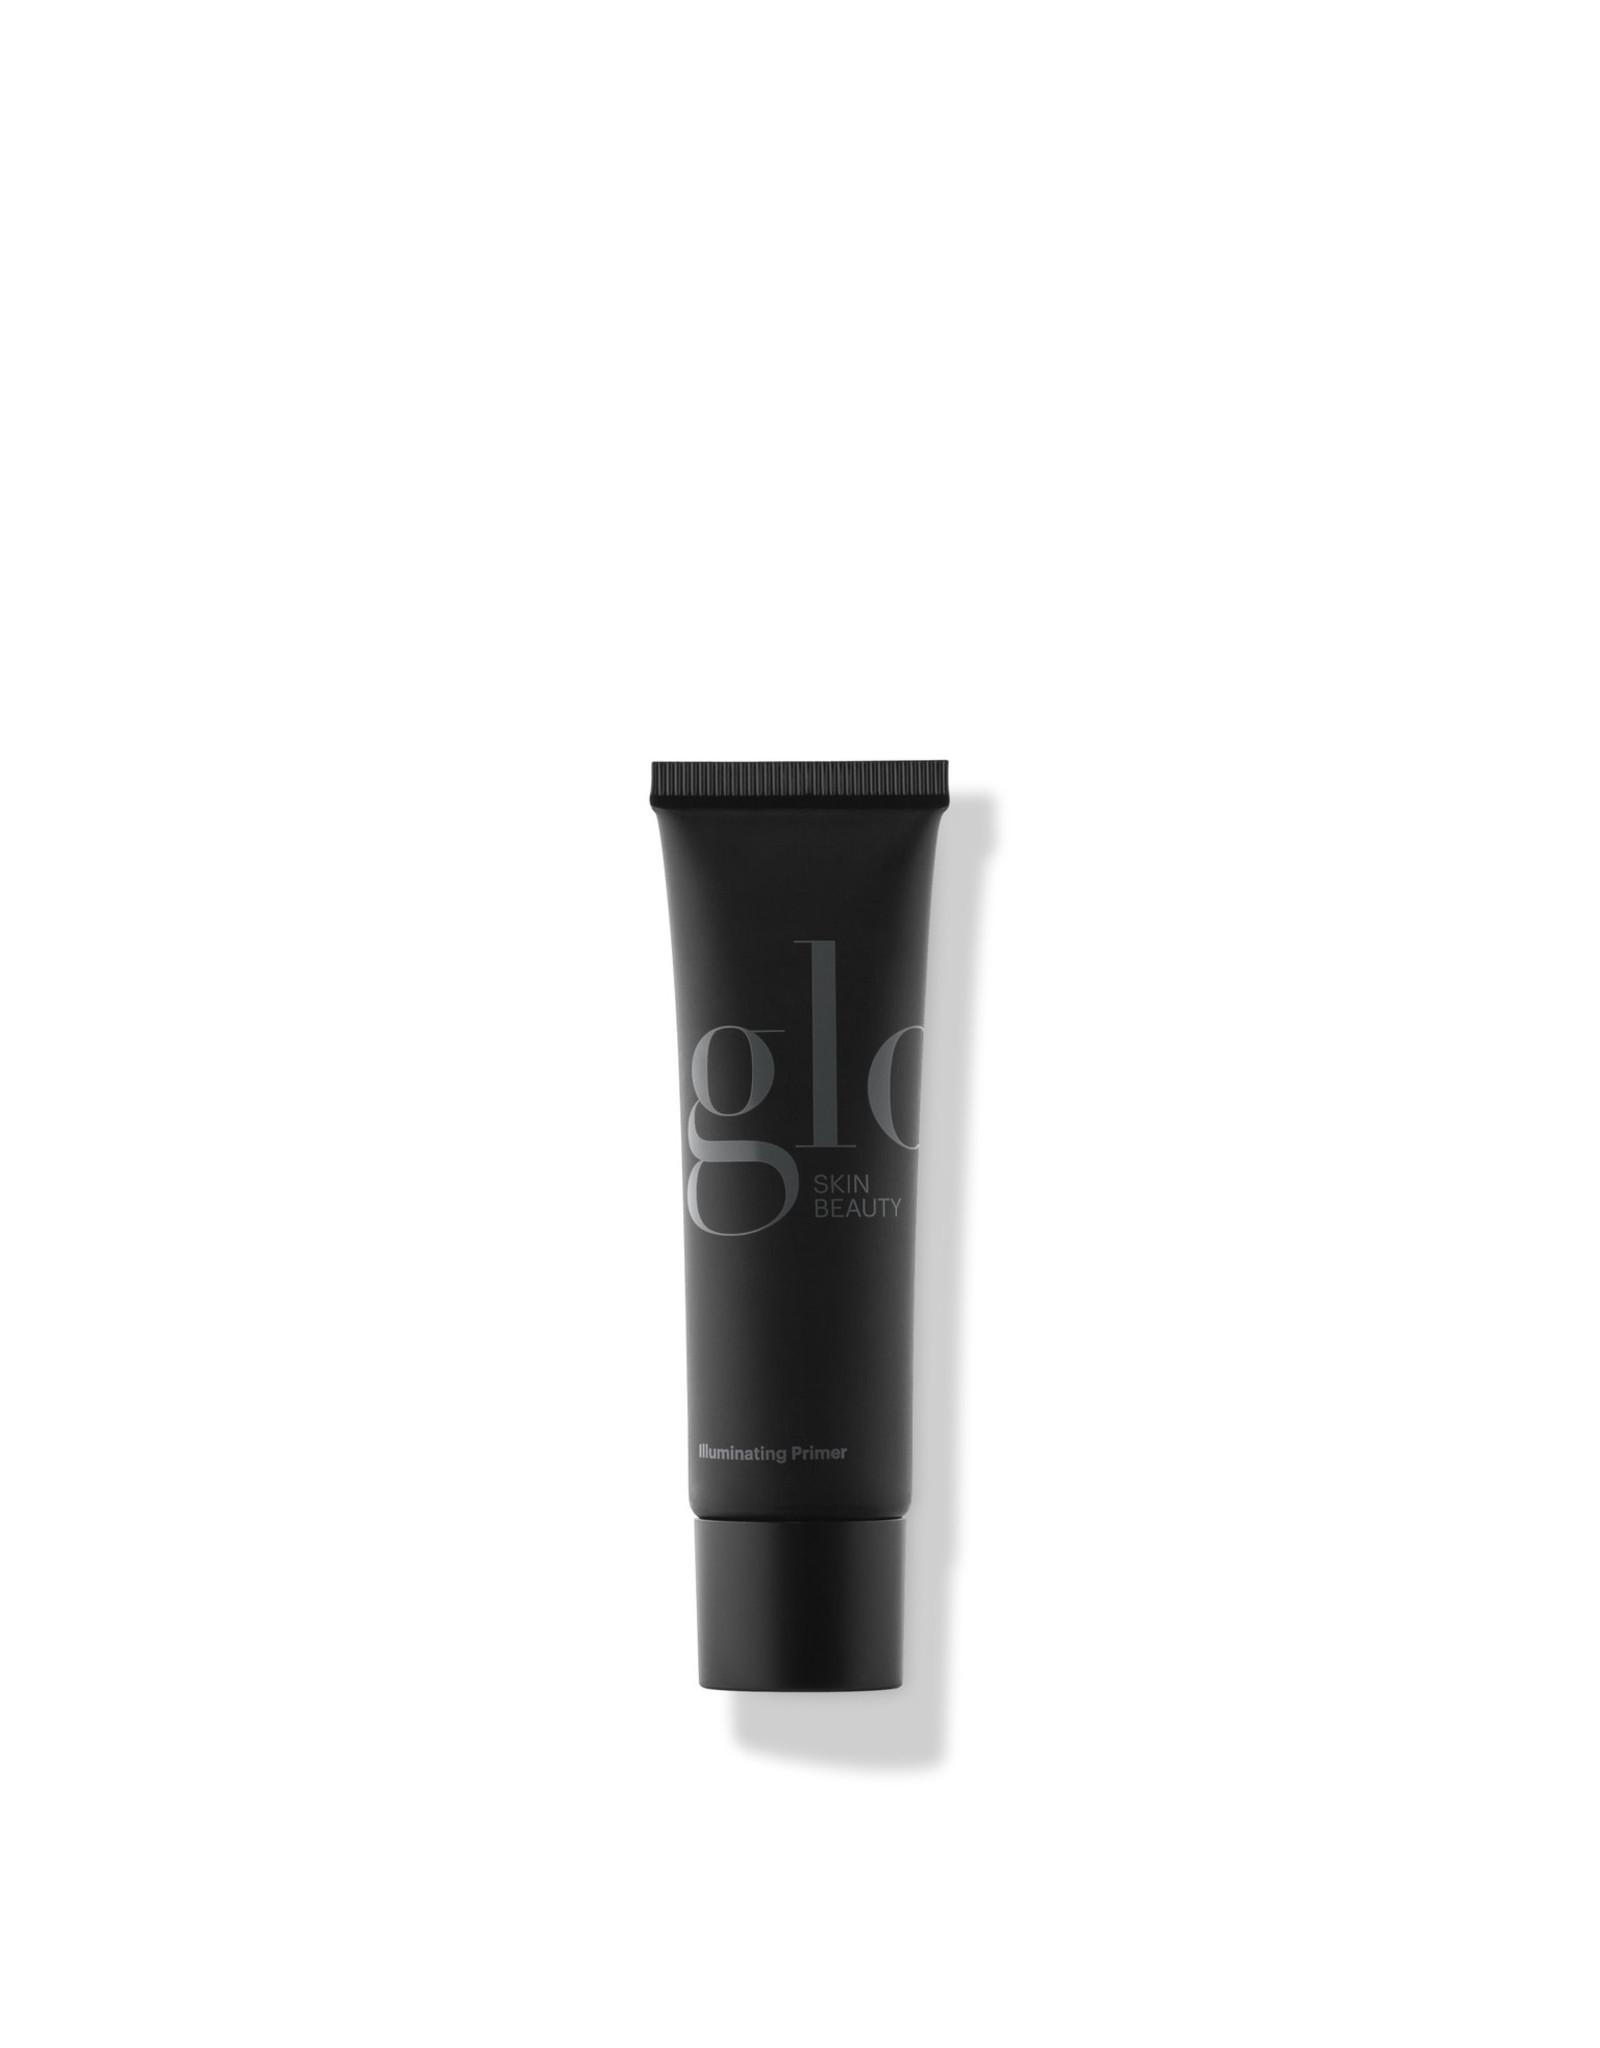 Glo Skin Beauty Illuminating Primer